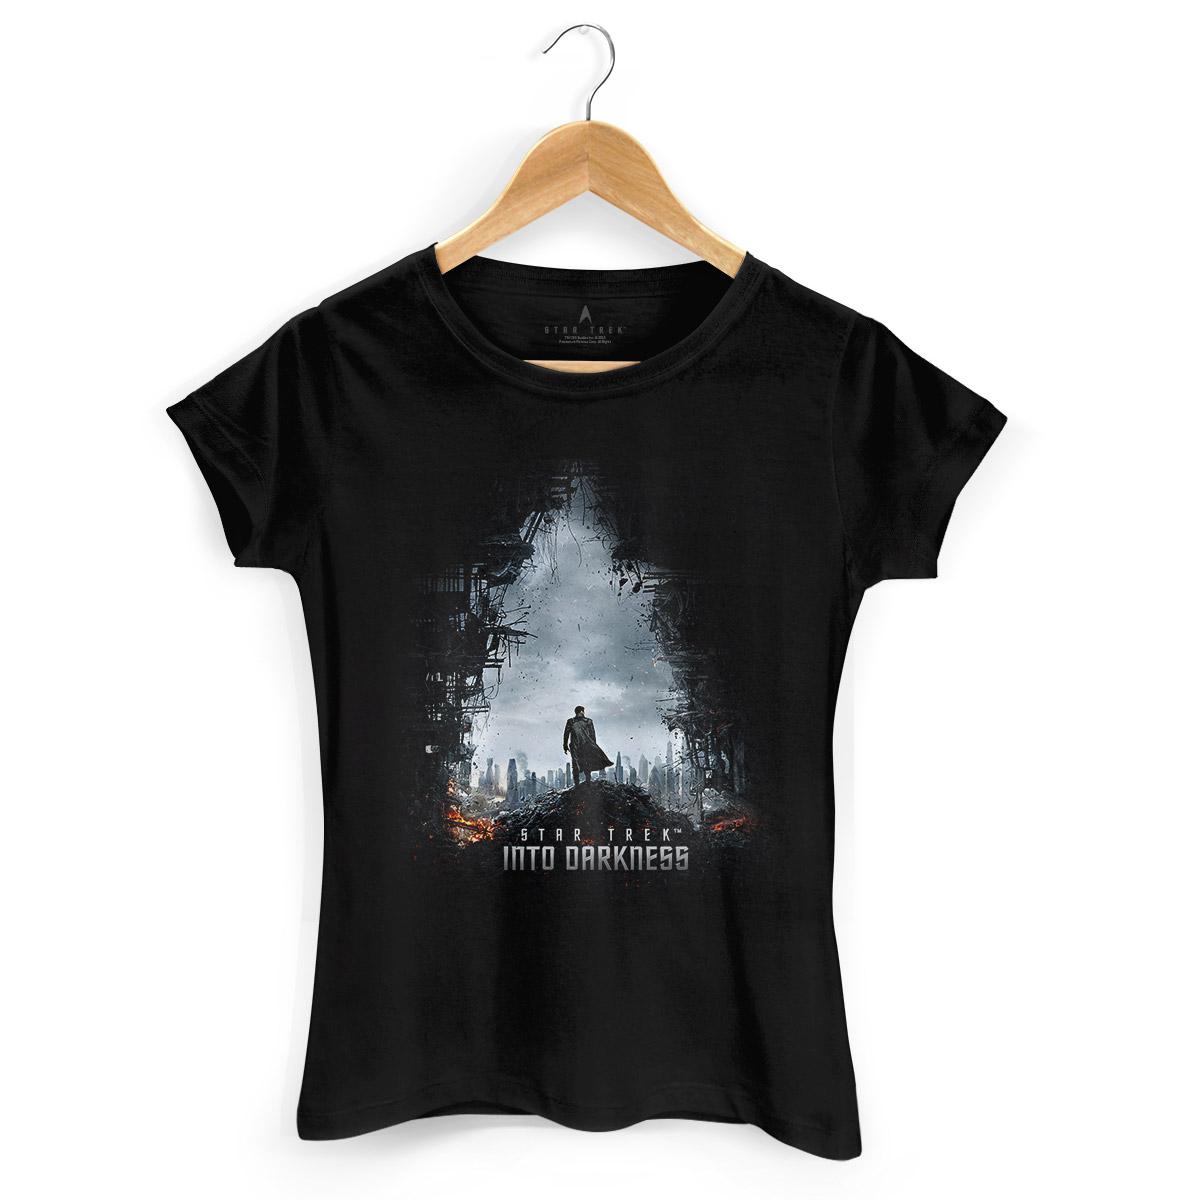 Camiseta Feminina Star Trek Into Darkness